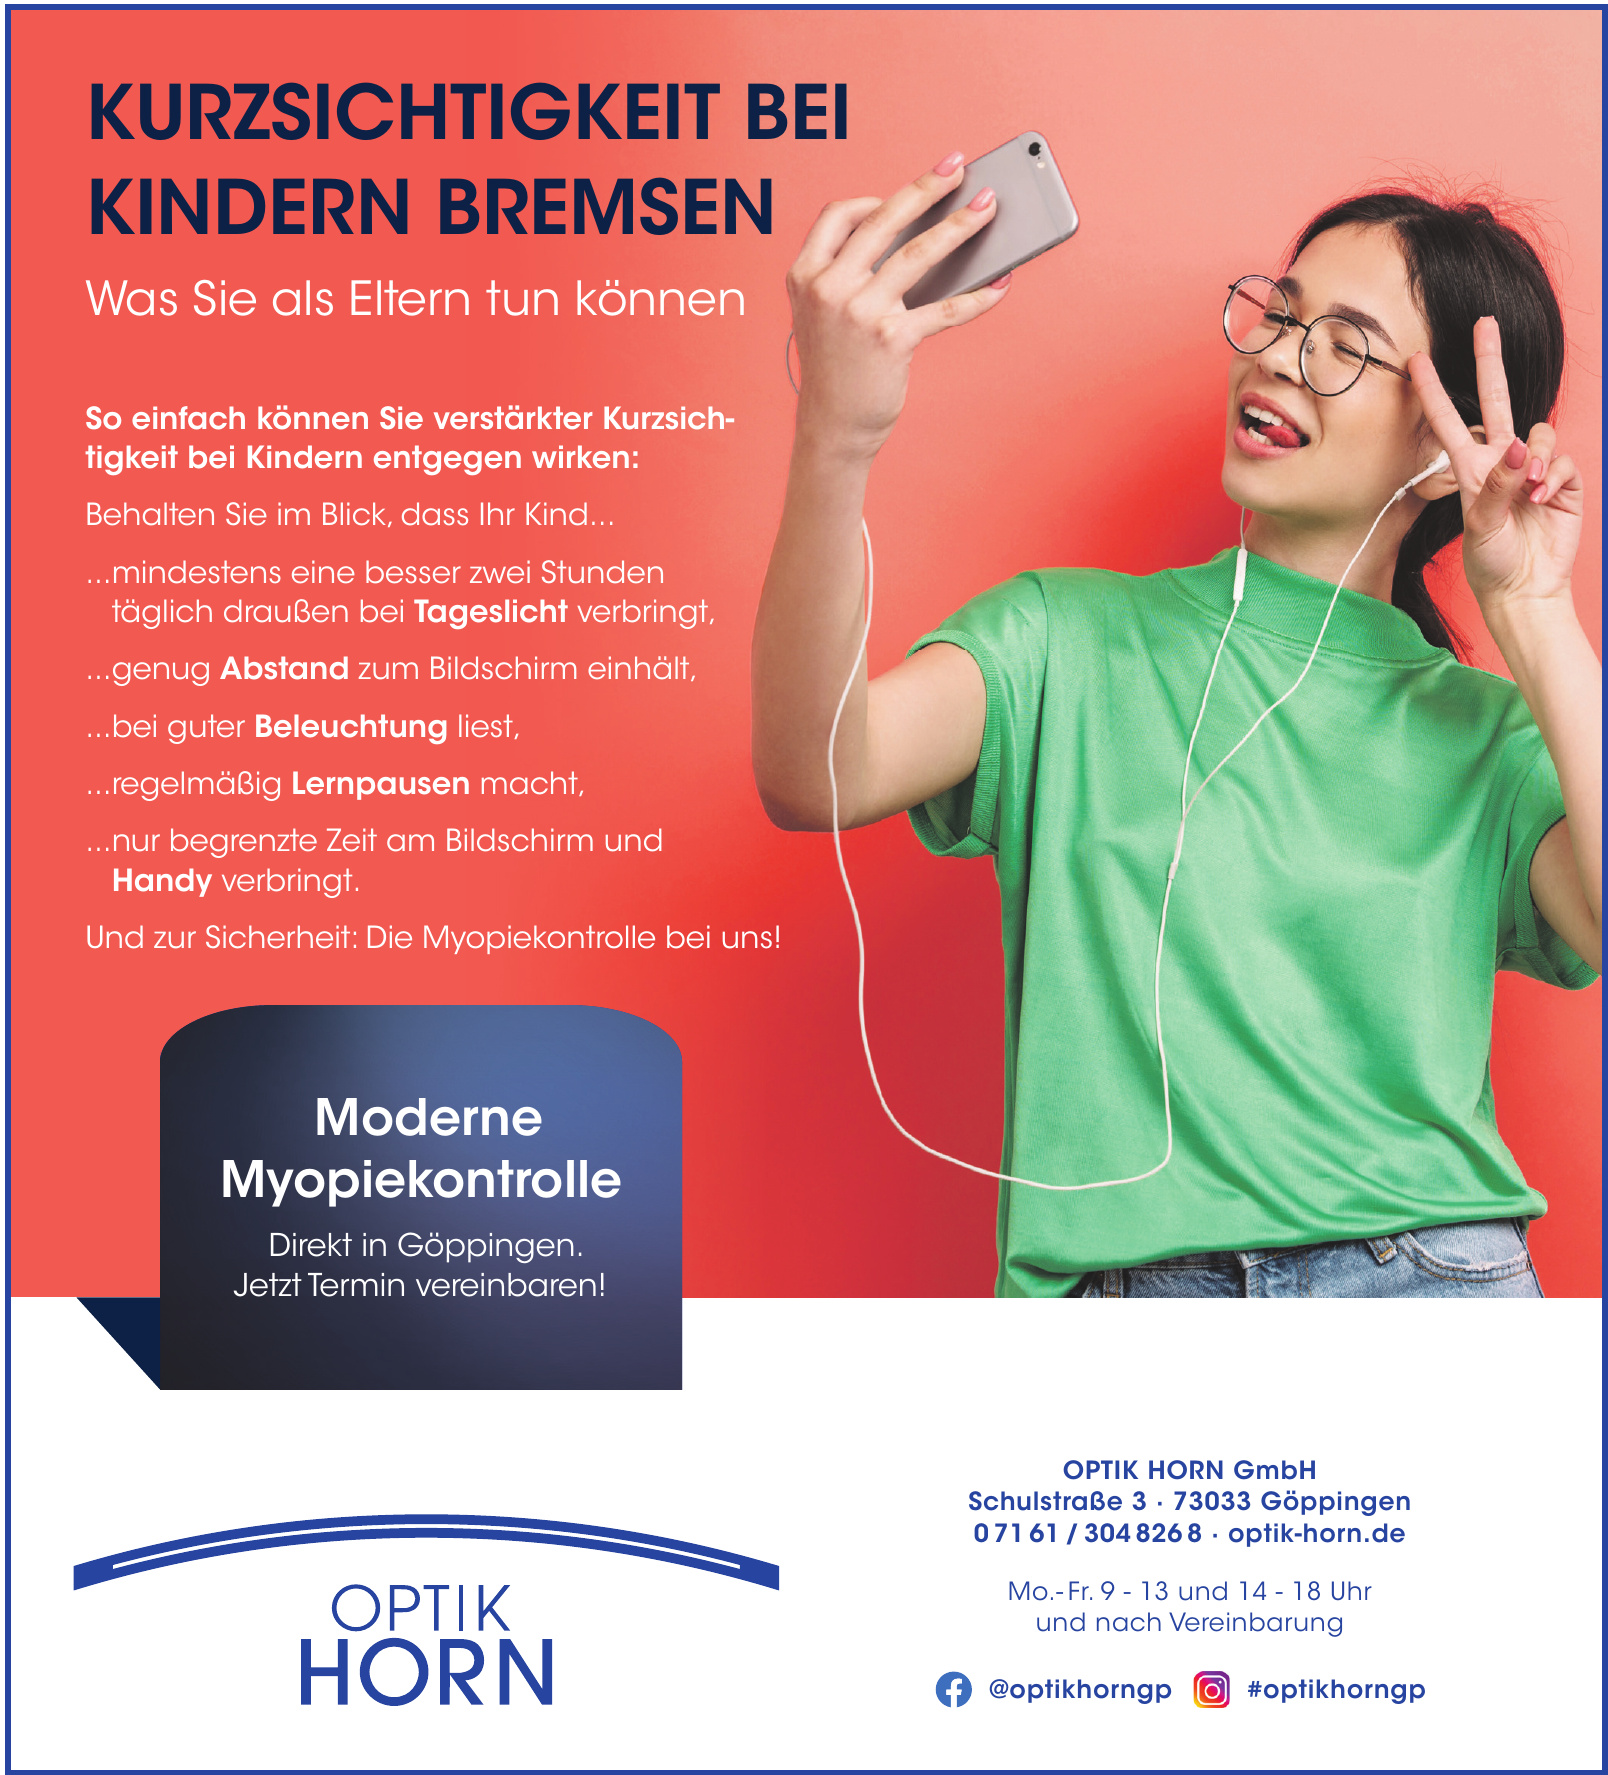 Optik Horn GmbH